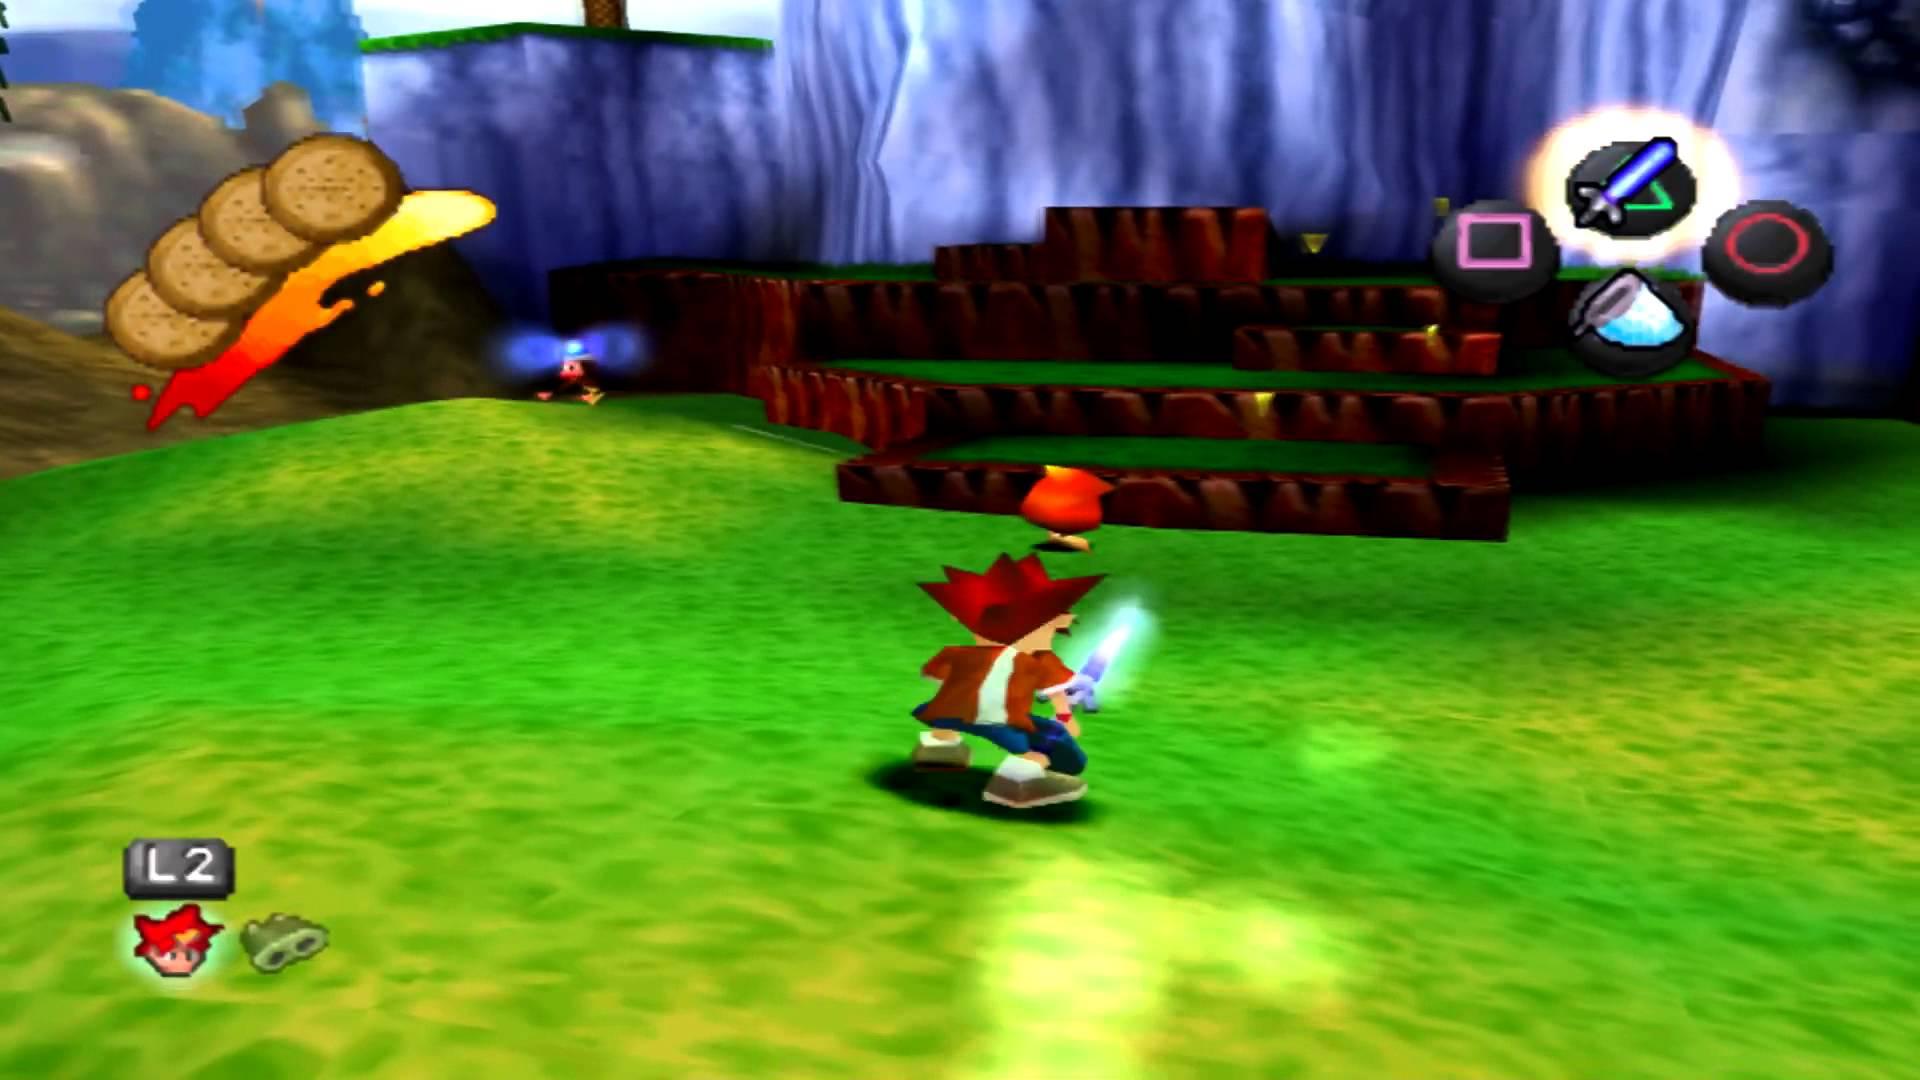 Ape Escape - First level screenshot